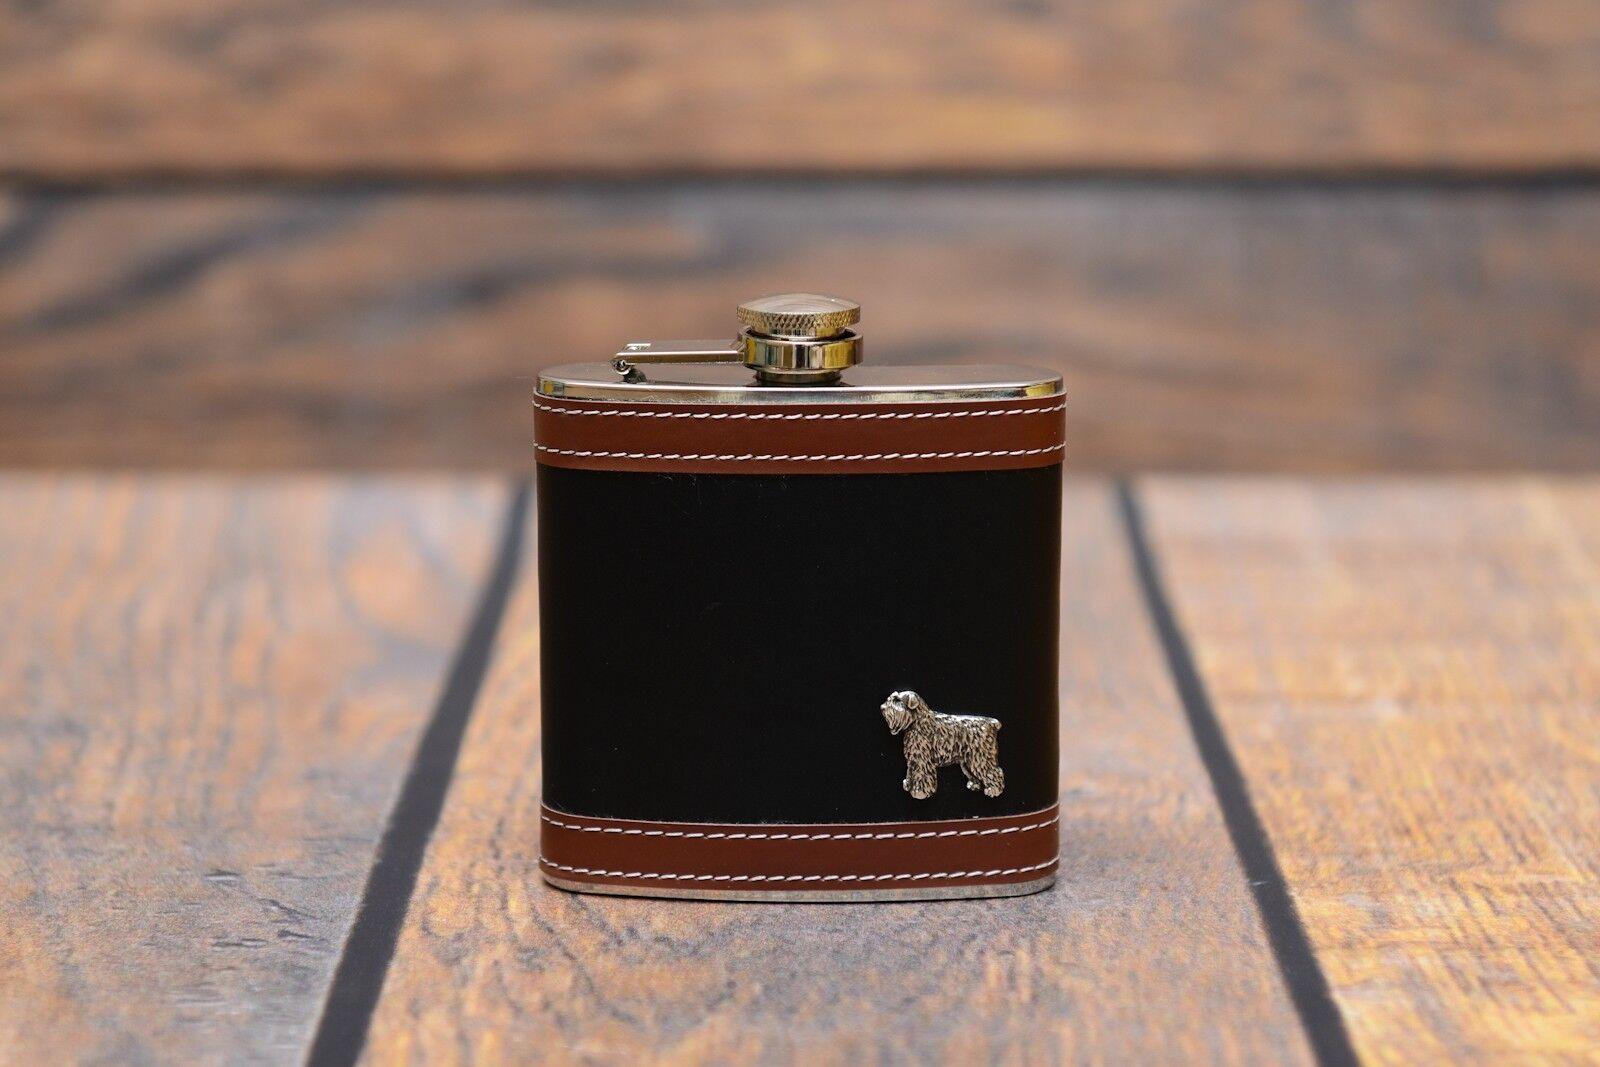 Bouvier des Flandres - flask with image of a dog, high quality, Art Dog